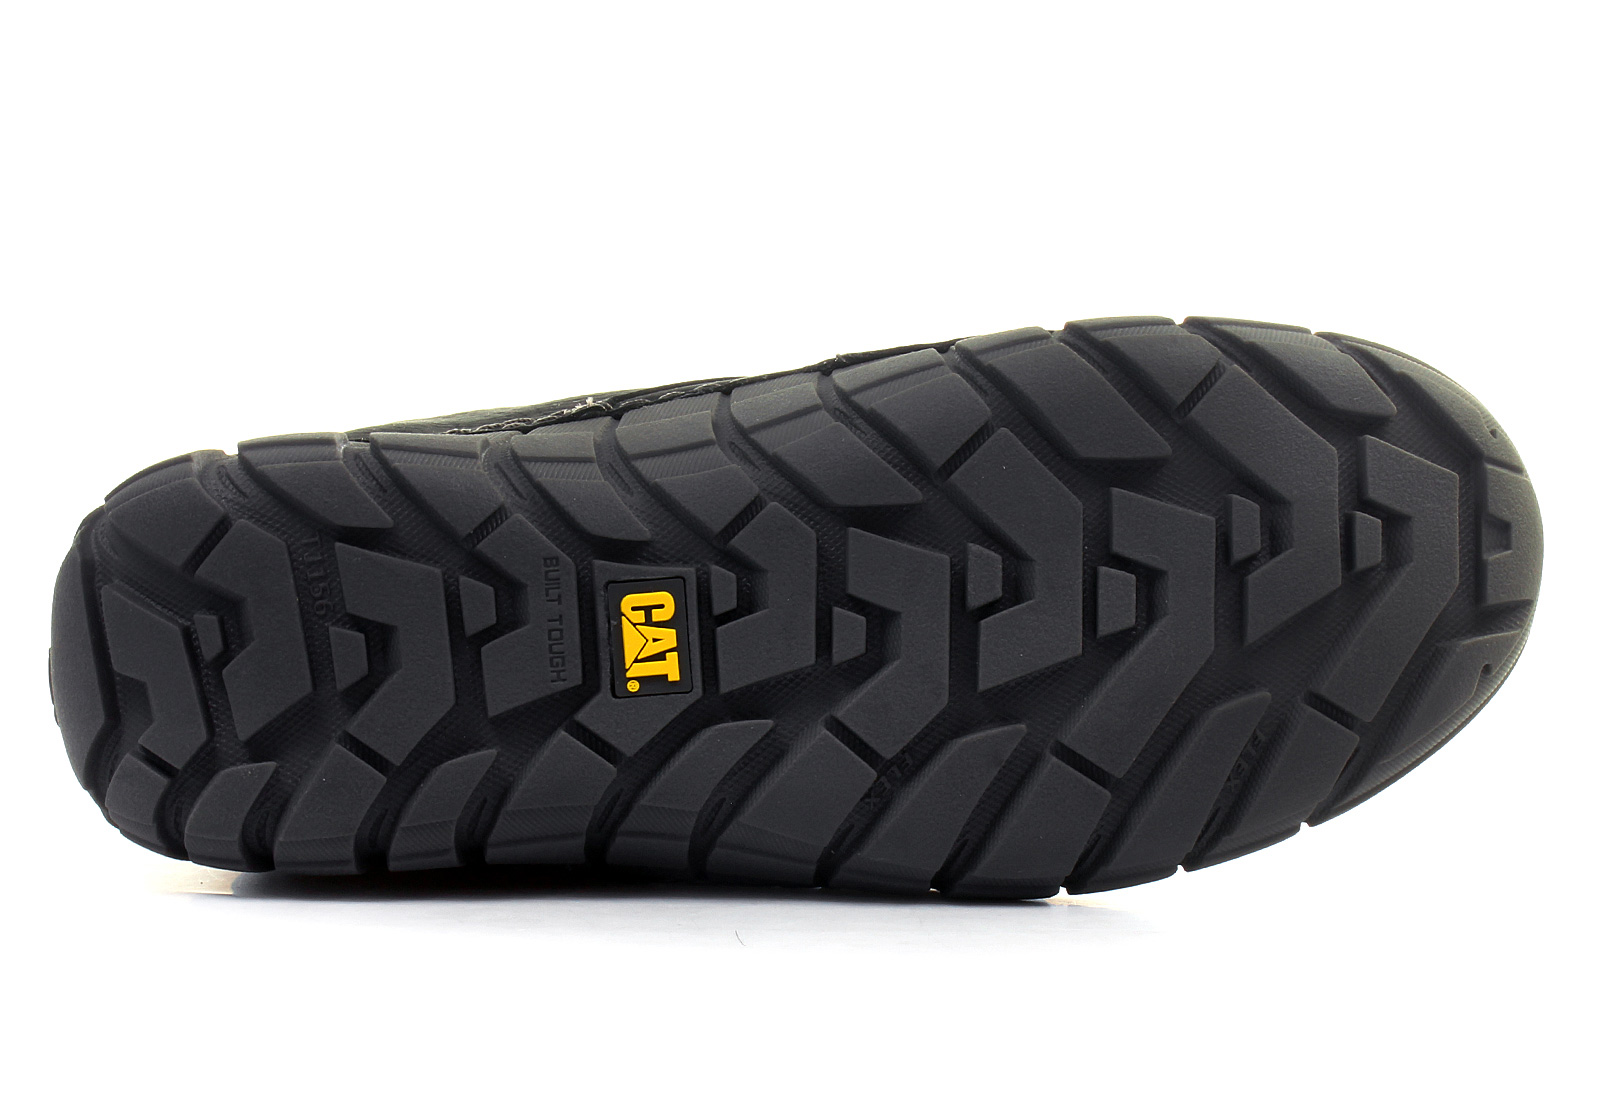 Cat Shoes Dryton 717869 Blk Online Shop For Sneakers